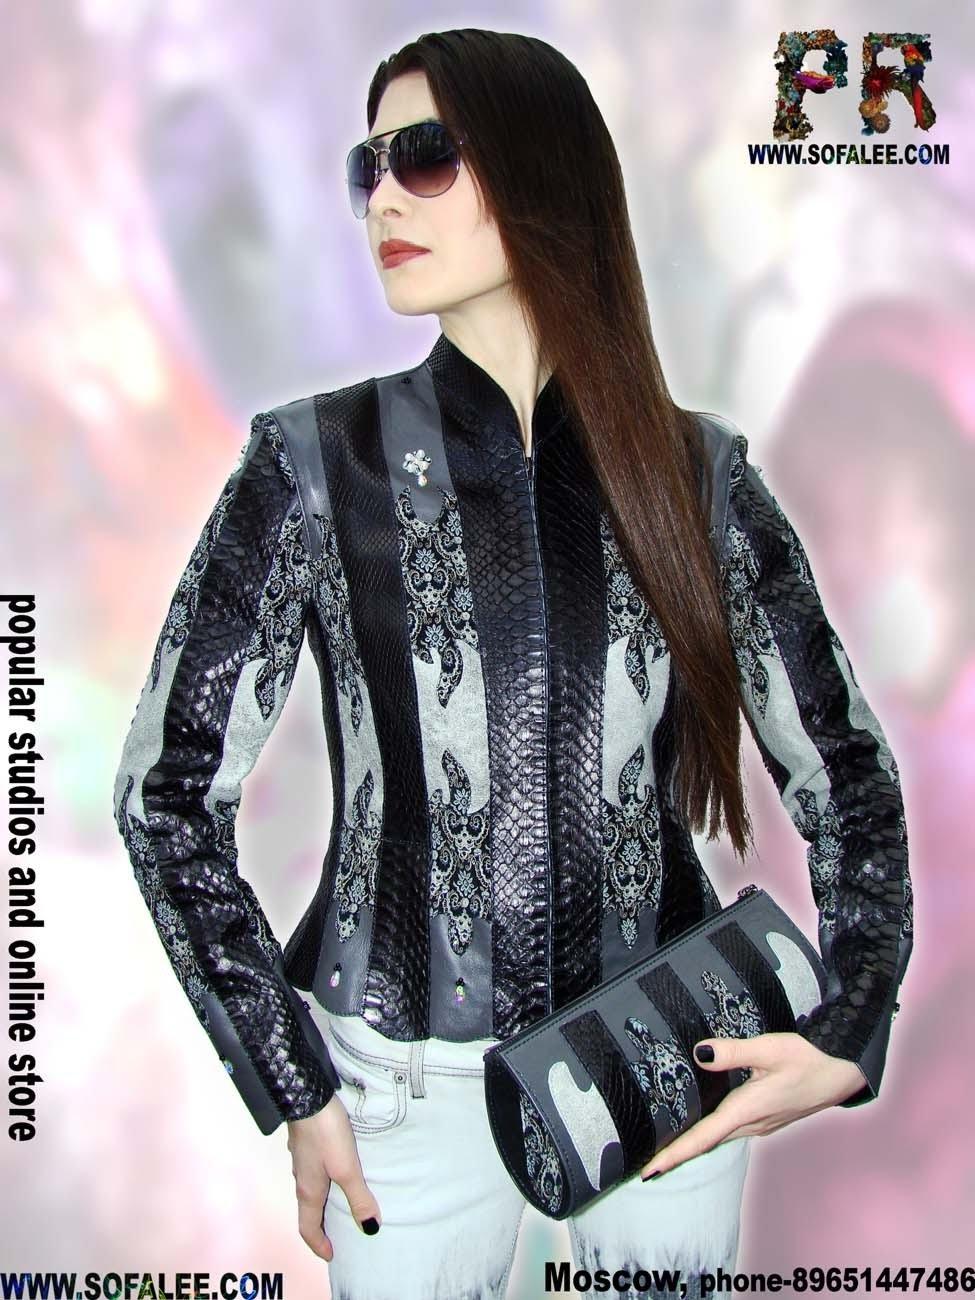 Фото девушки в куртке из кожи питона.Girl to jacket of python skin